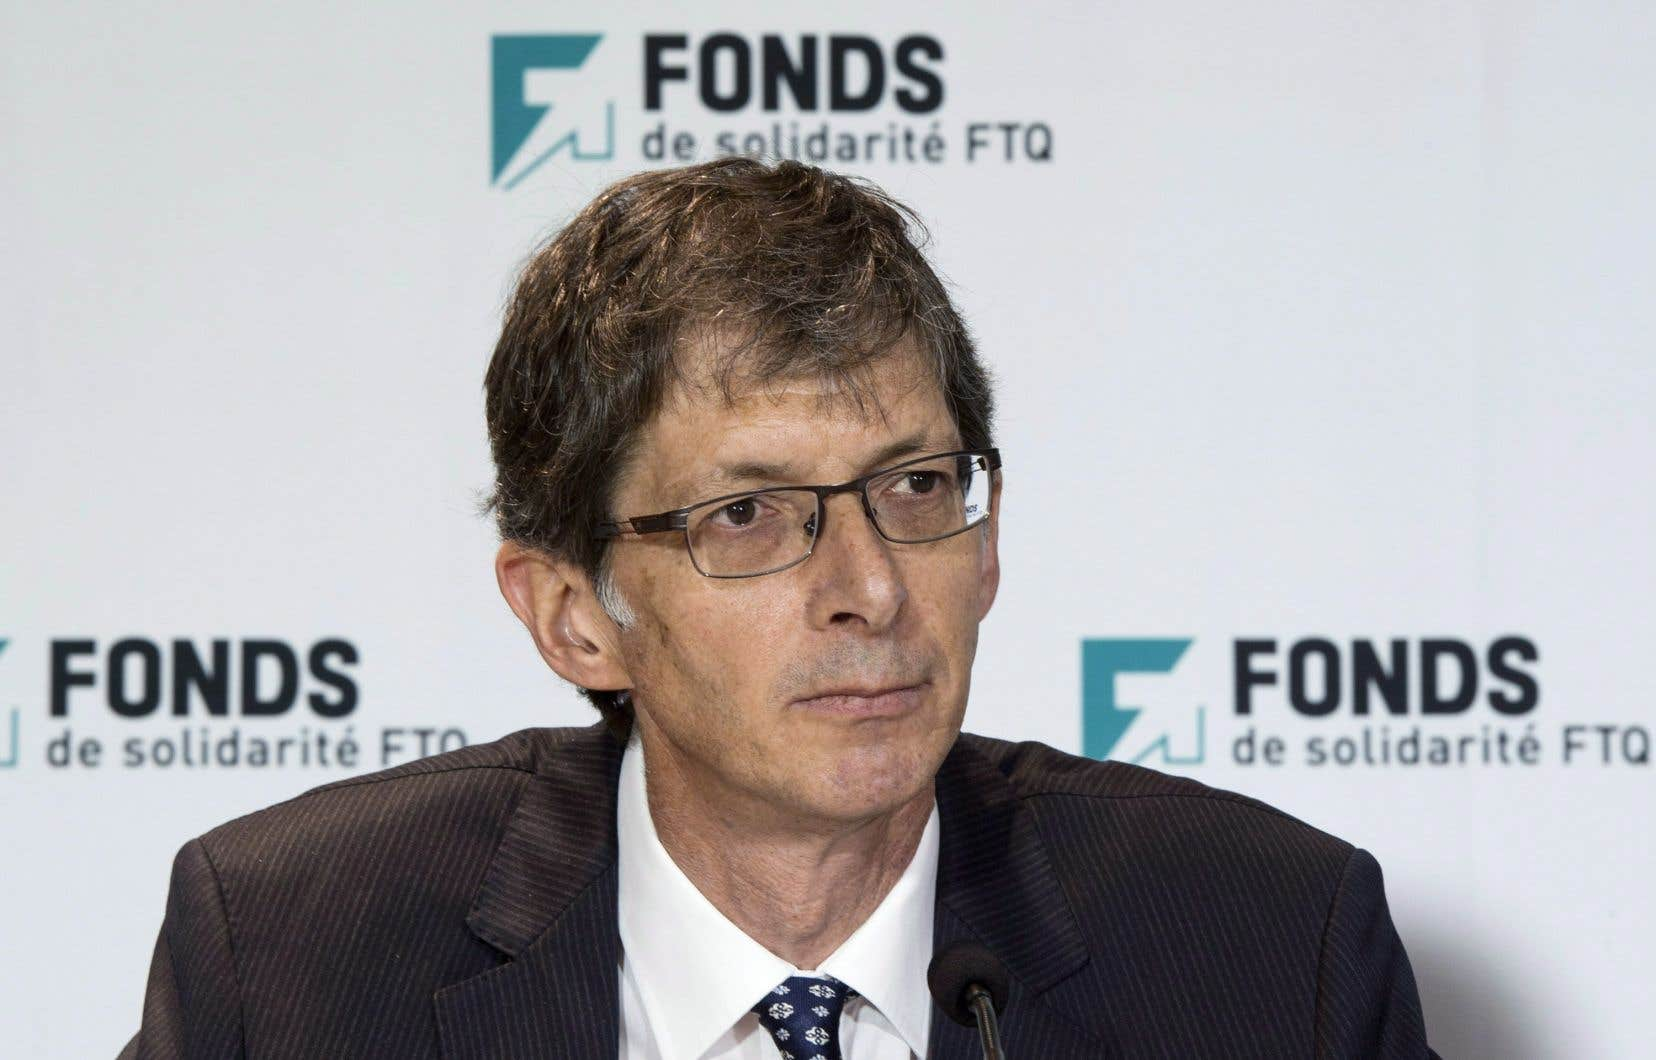 Le président du Fonds de solidarité FTQ, Gaétan Morin